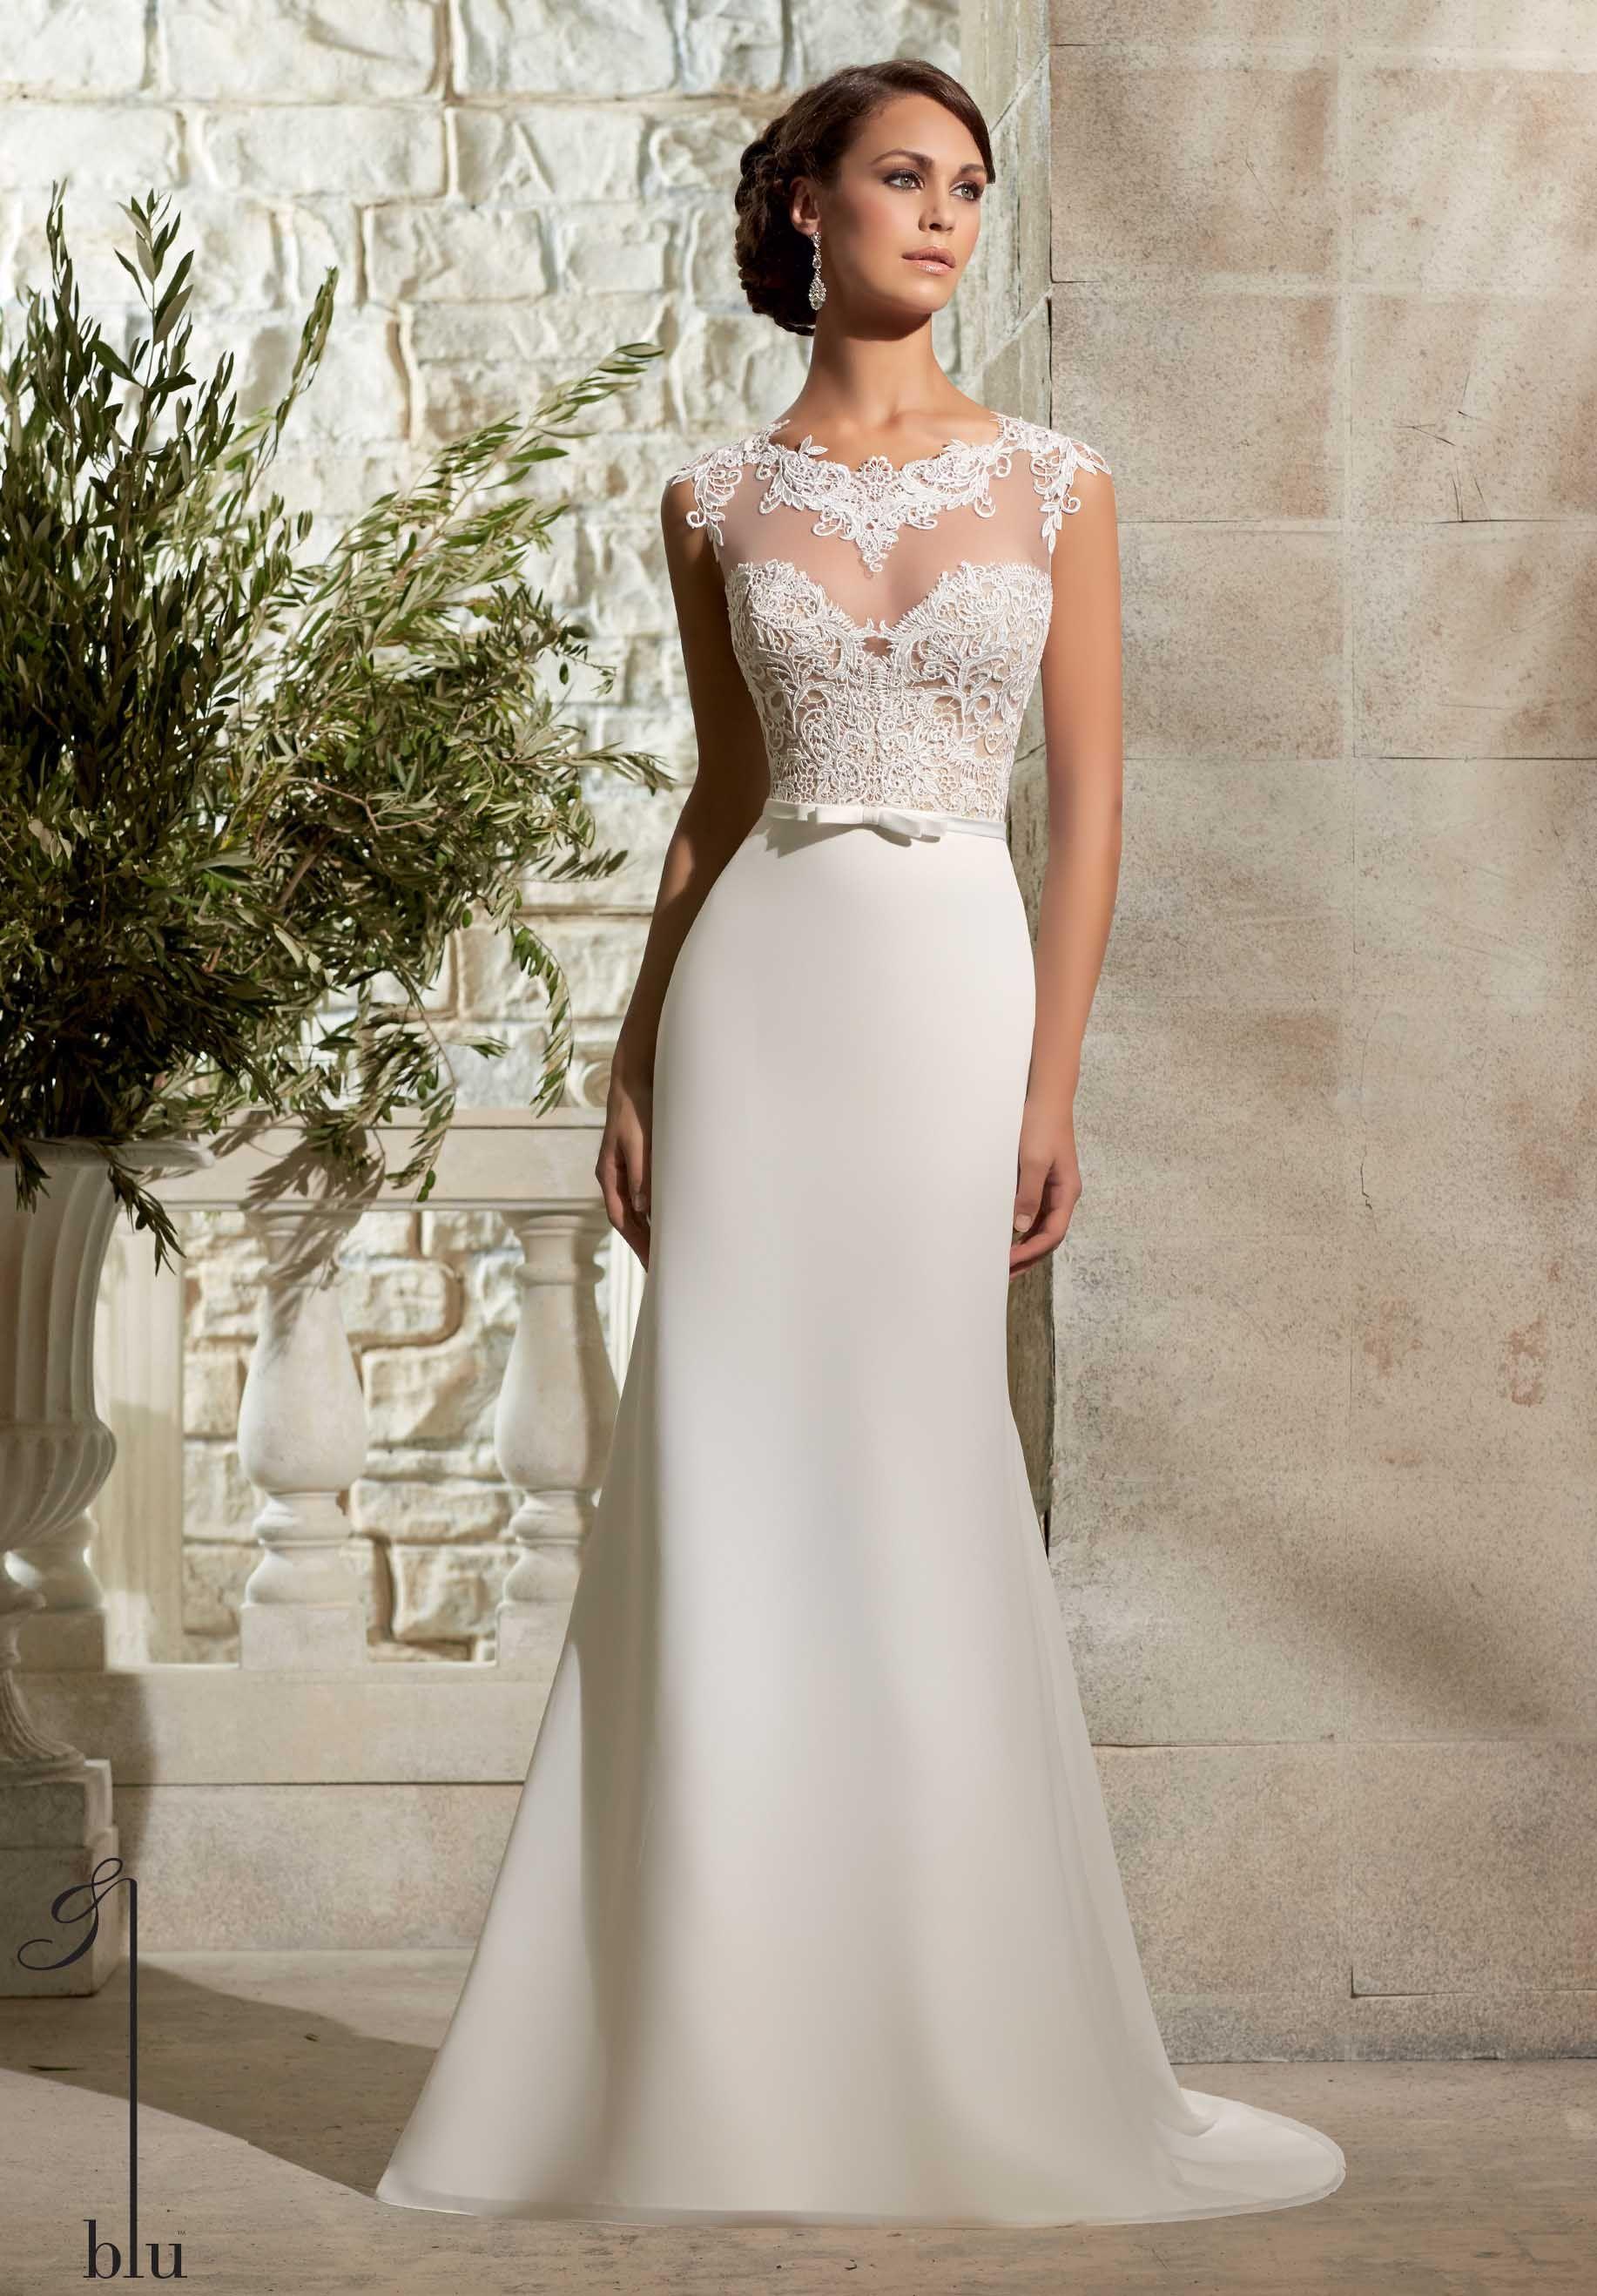 Plus size wedding dress rental    wedding dresses  Pinterest  Mori lee Gowns and Satin